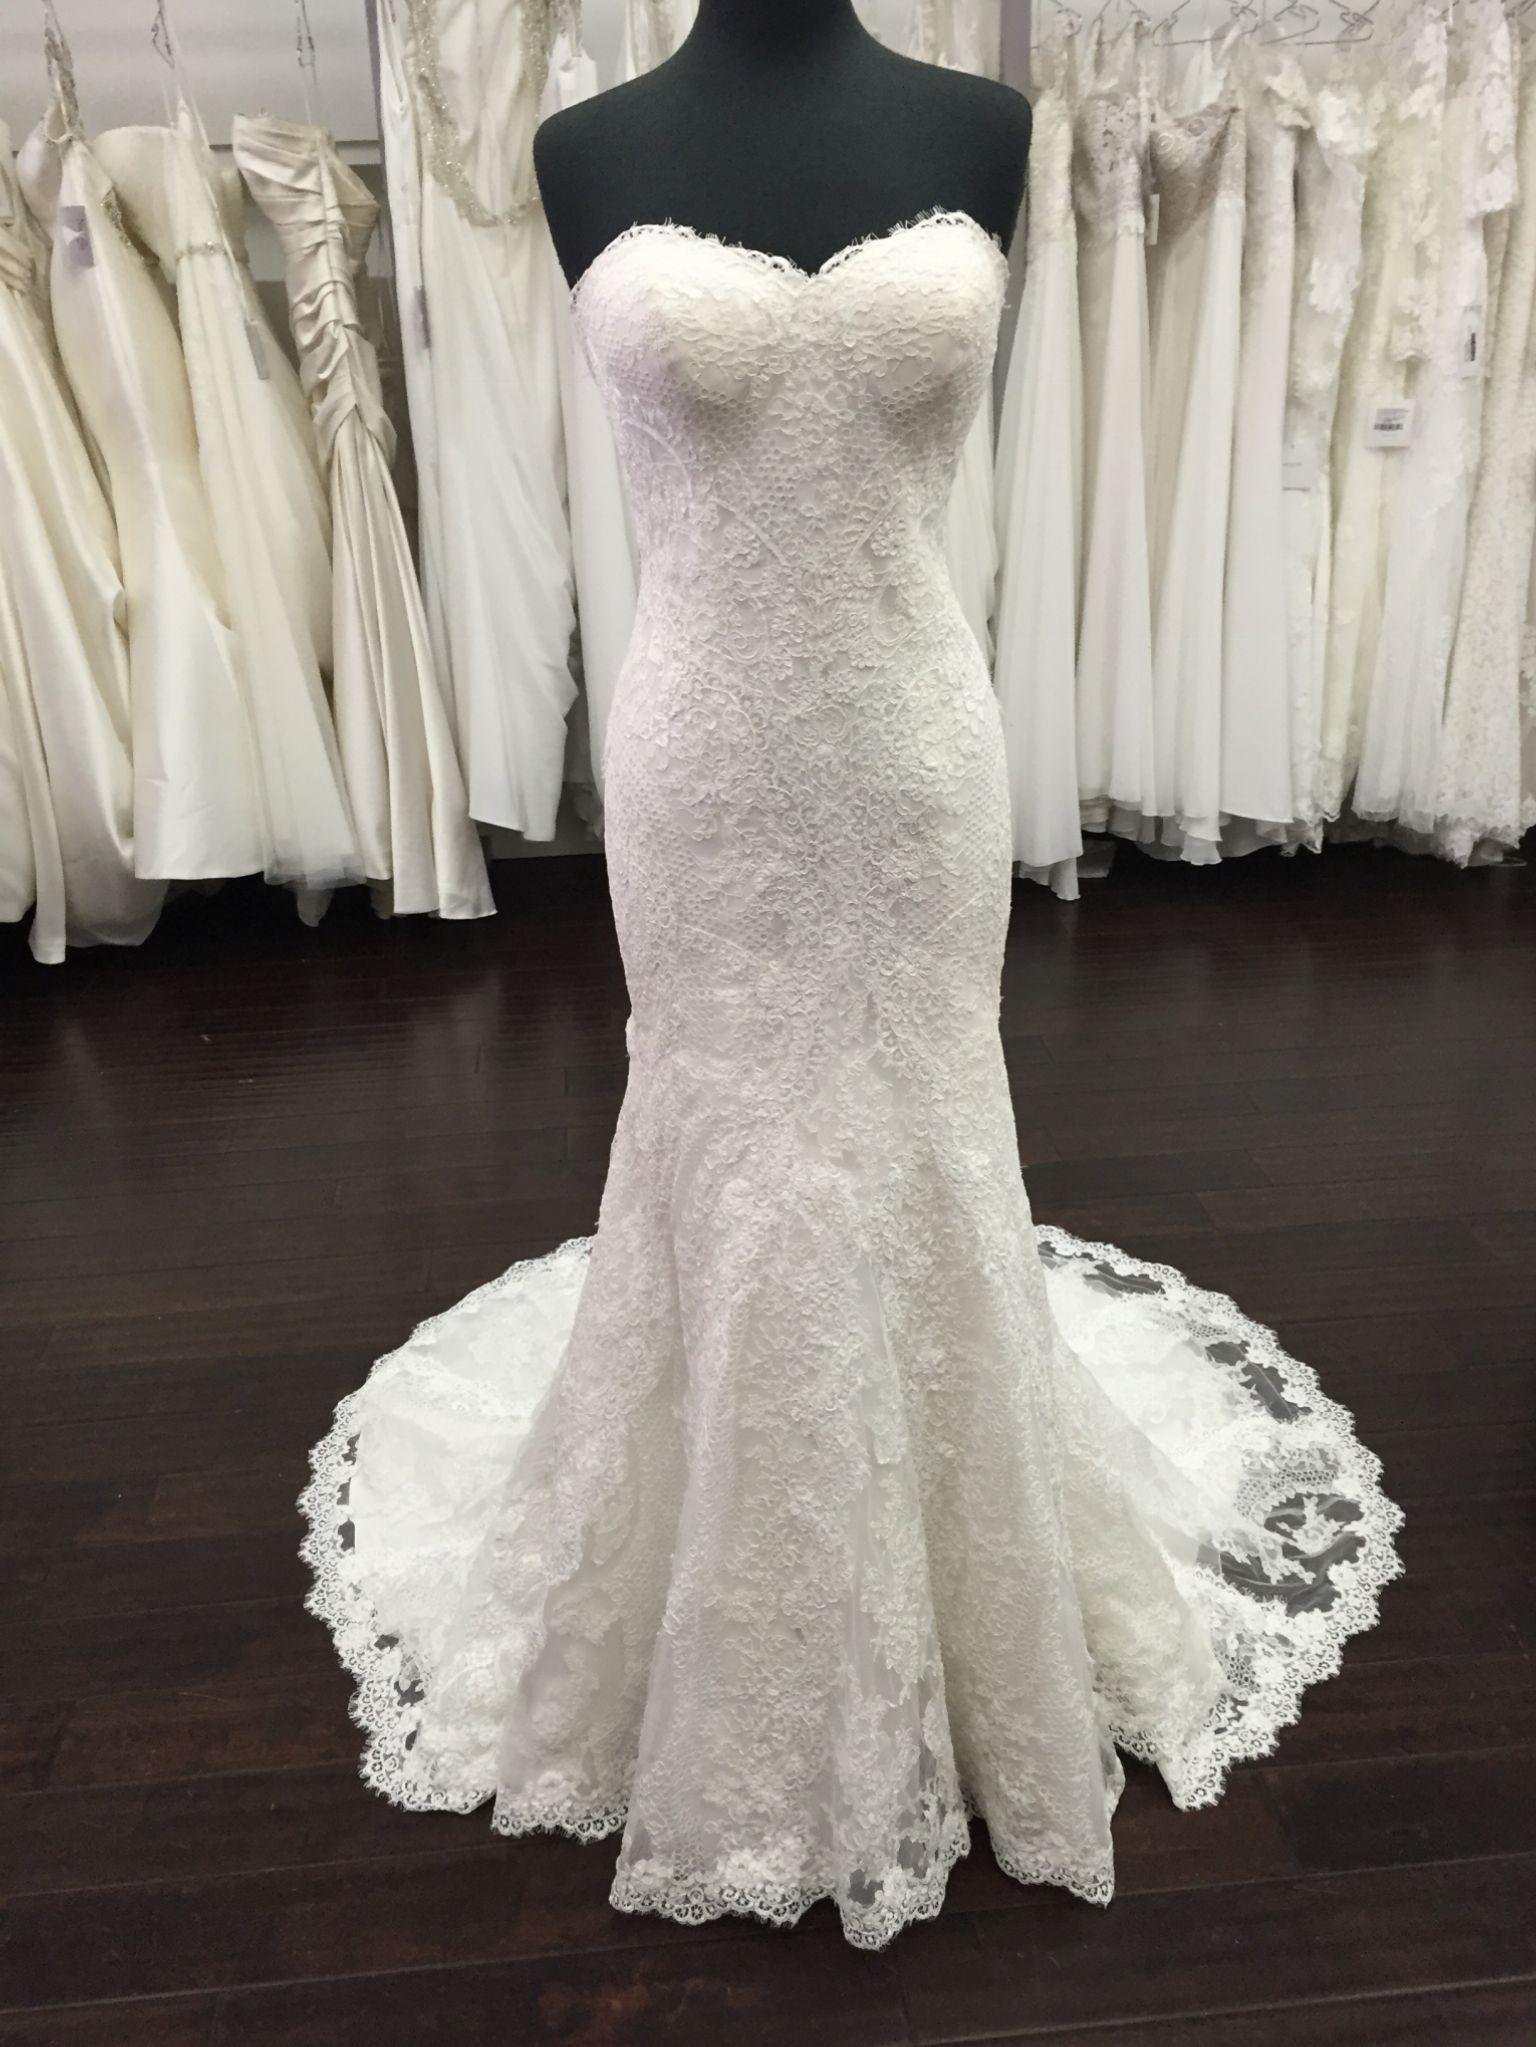 Essense Of Australia D2224 700 Size 14 Sle Wedding Dresses: Size 14 Wedding Dresses At Reisefeber.org